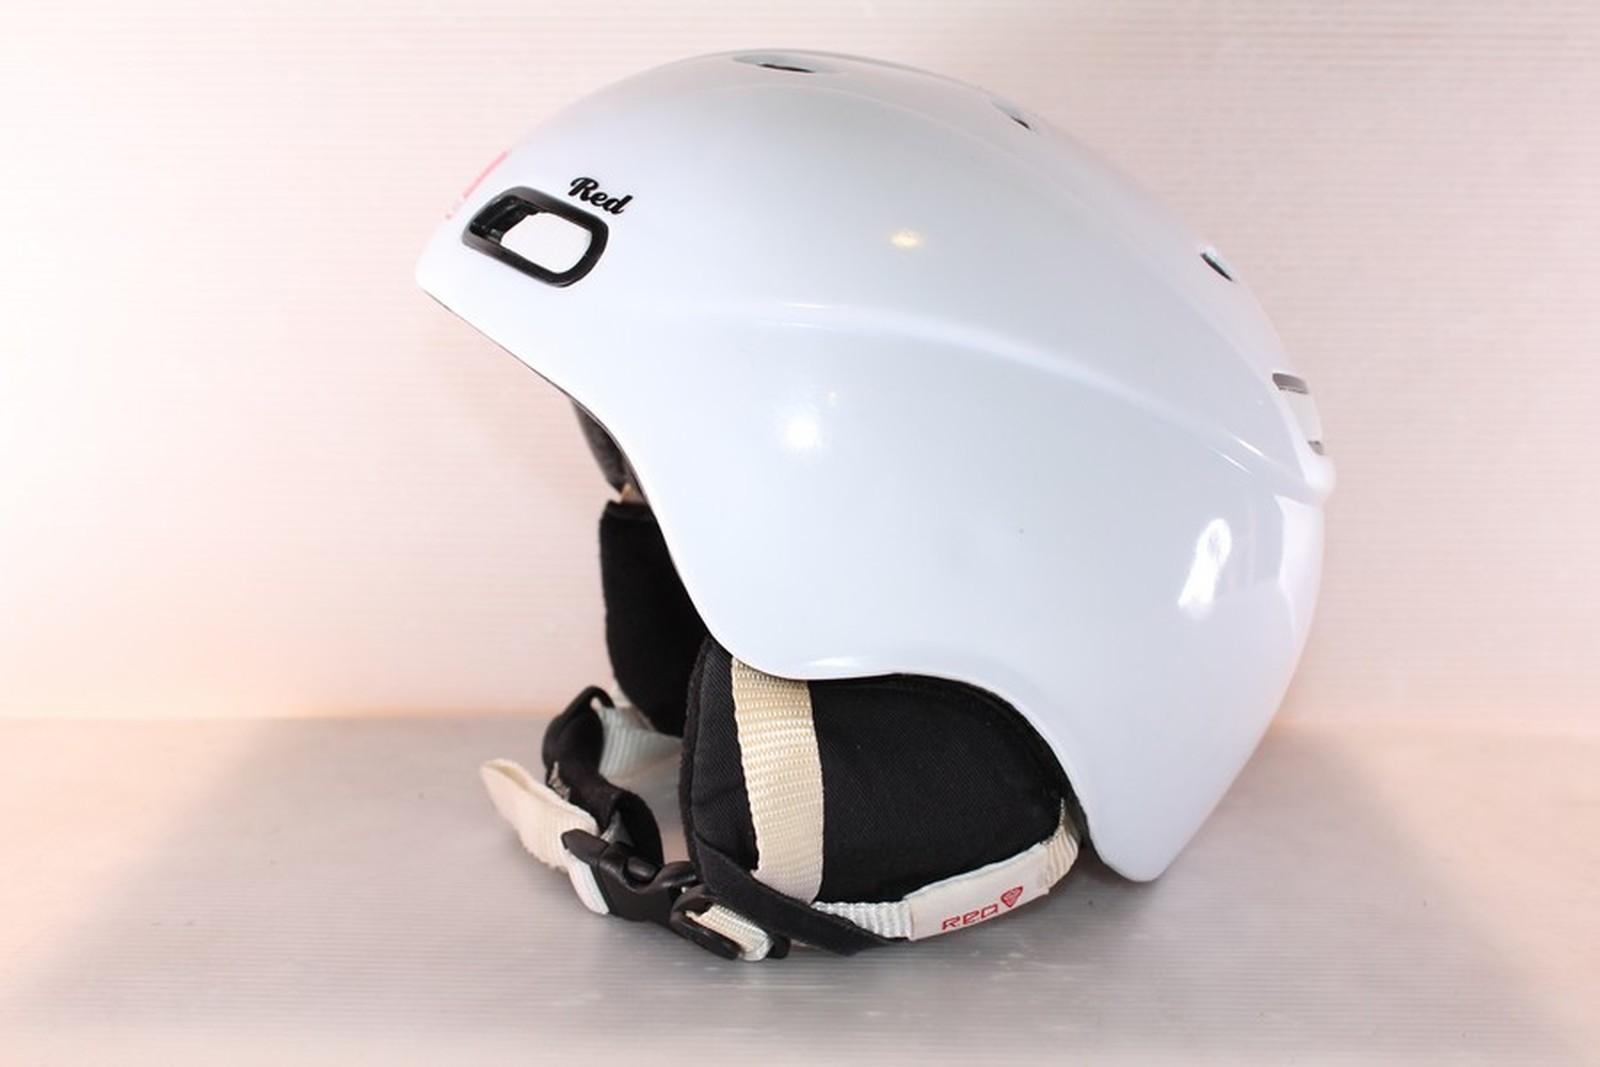 Dámská lyžařská helma R.E.D. Reya - posuvná vel. 59 - 61